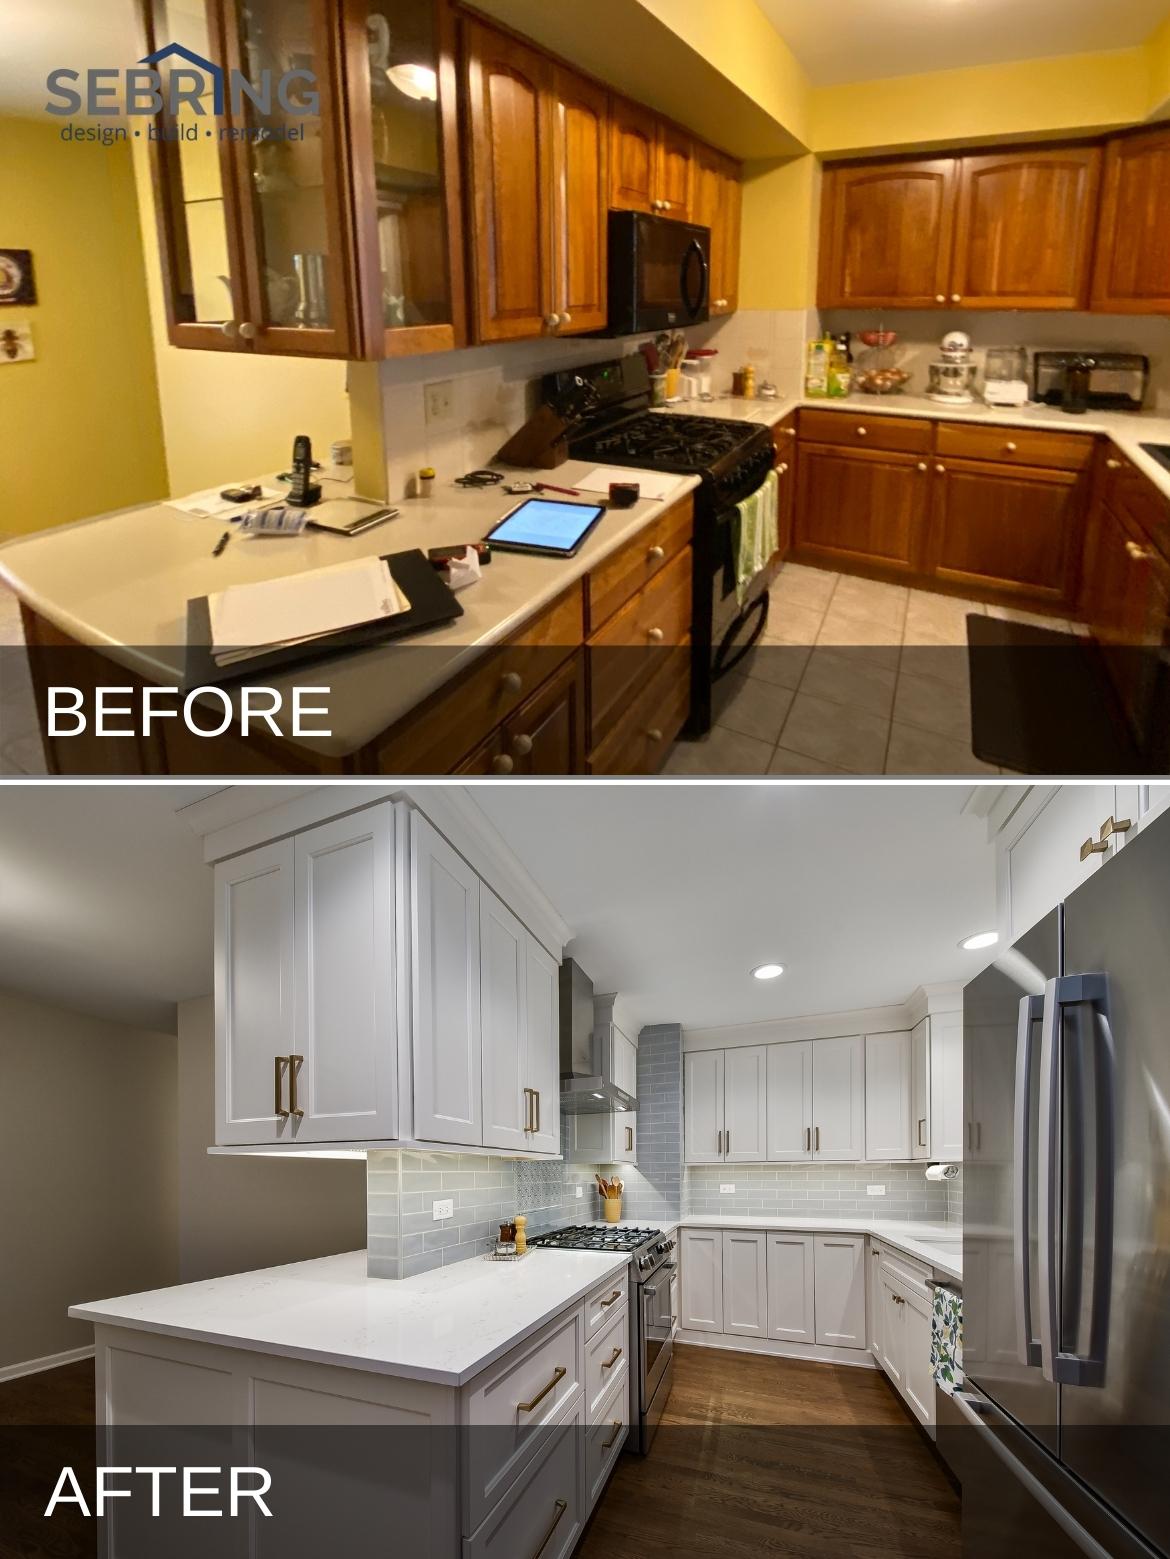 Glen Ellyn Kitchen Remodel Before and After 1